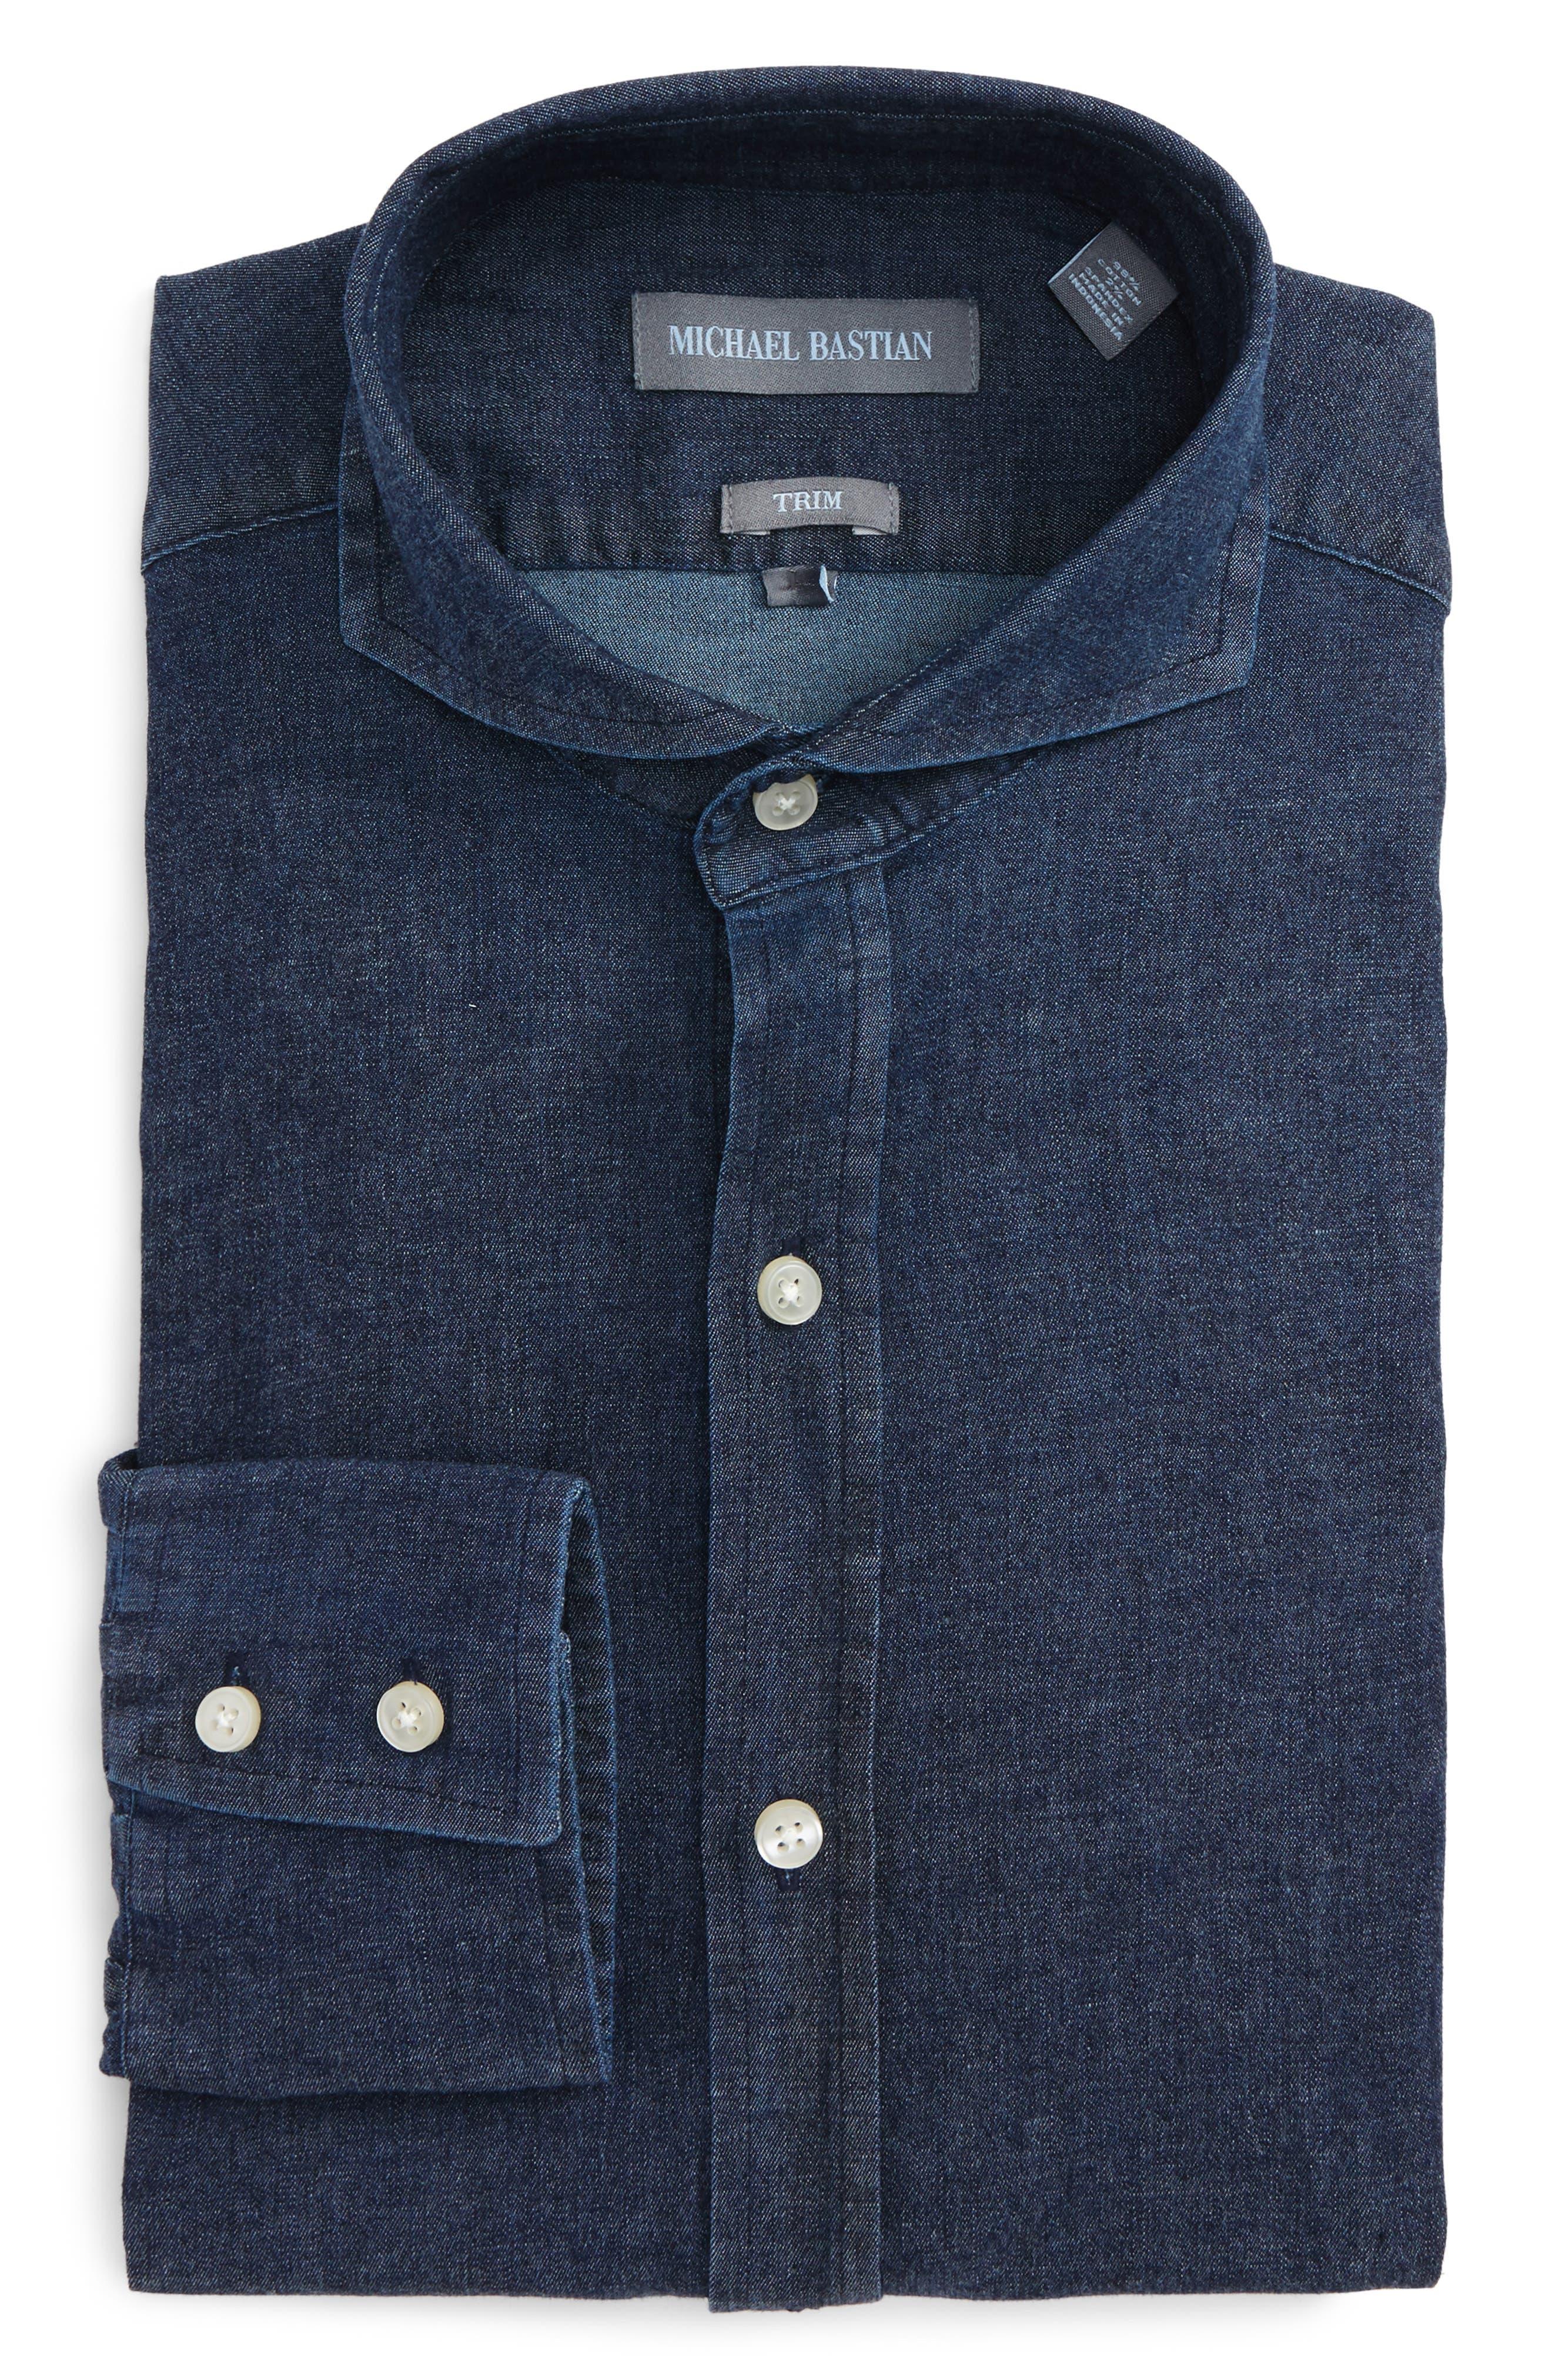 Trim Fit Chambray Shirt,                         Main,                         color, Navy